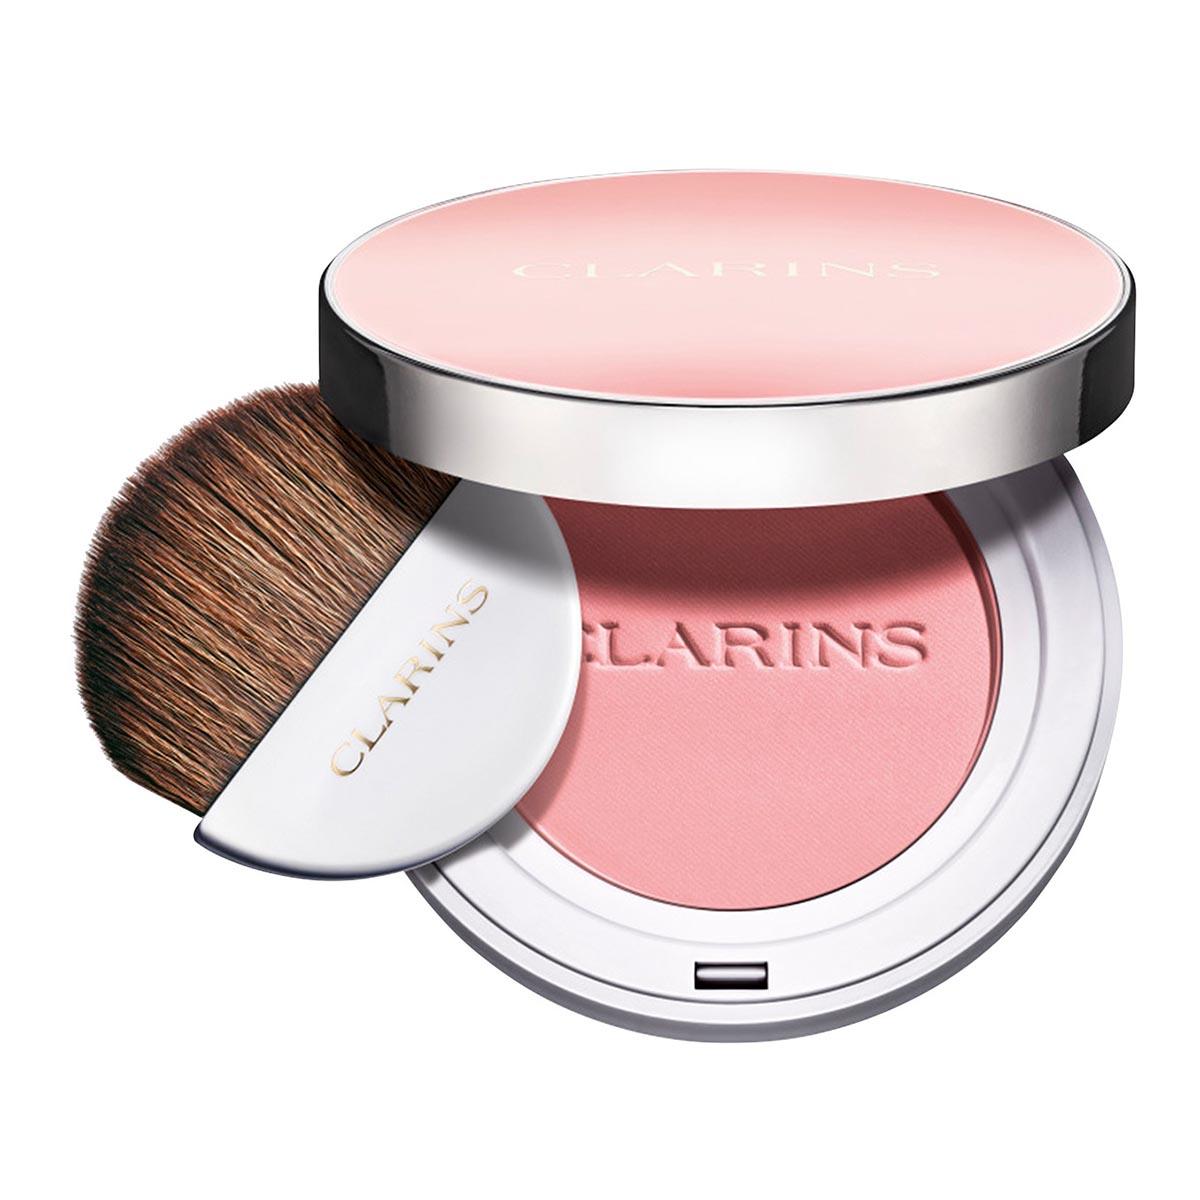 Clarins joli blush colorete 01 cheek baby